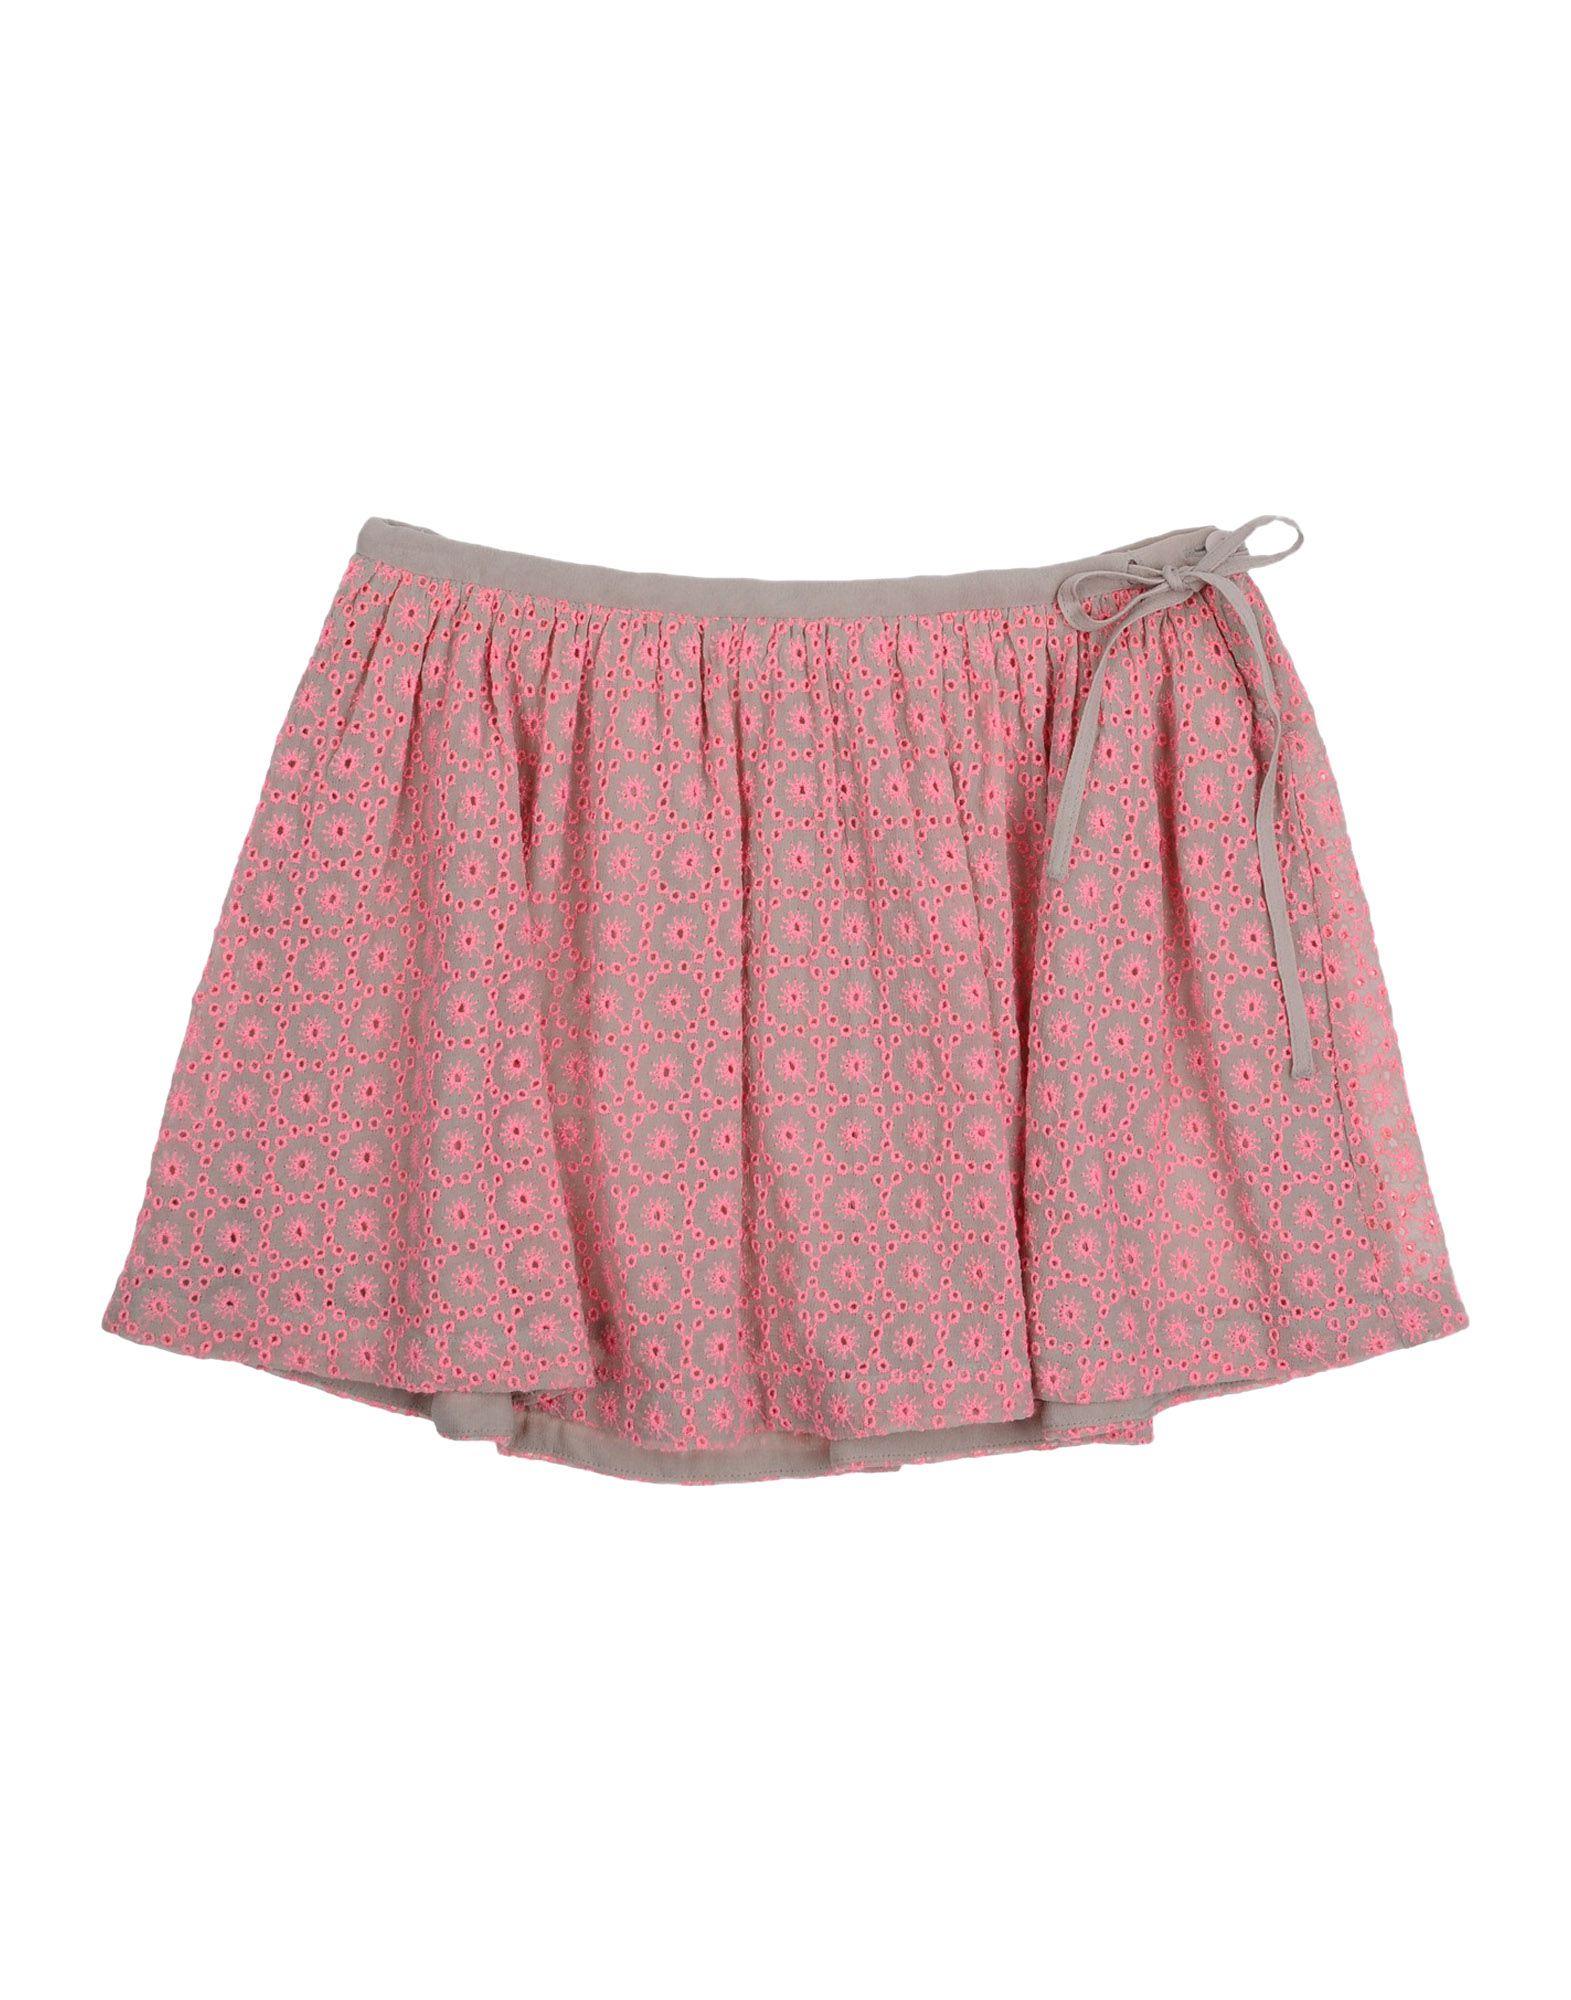 PREEN by THORNTON BREGAZZI Mädchen 3-8 jahre Rock Farbe Rosa Größe 6